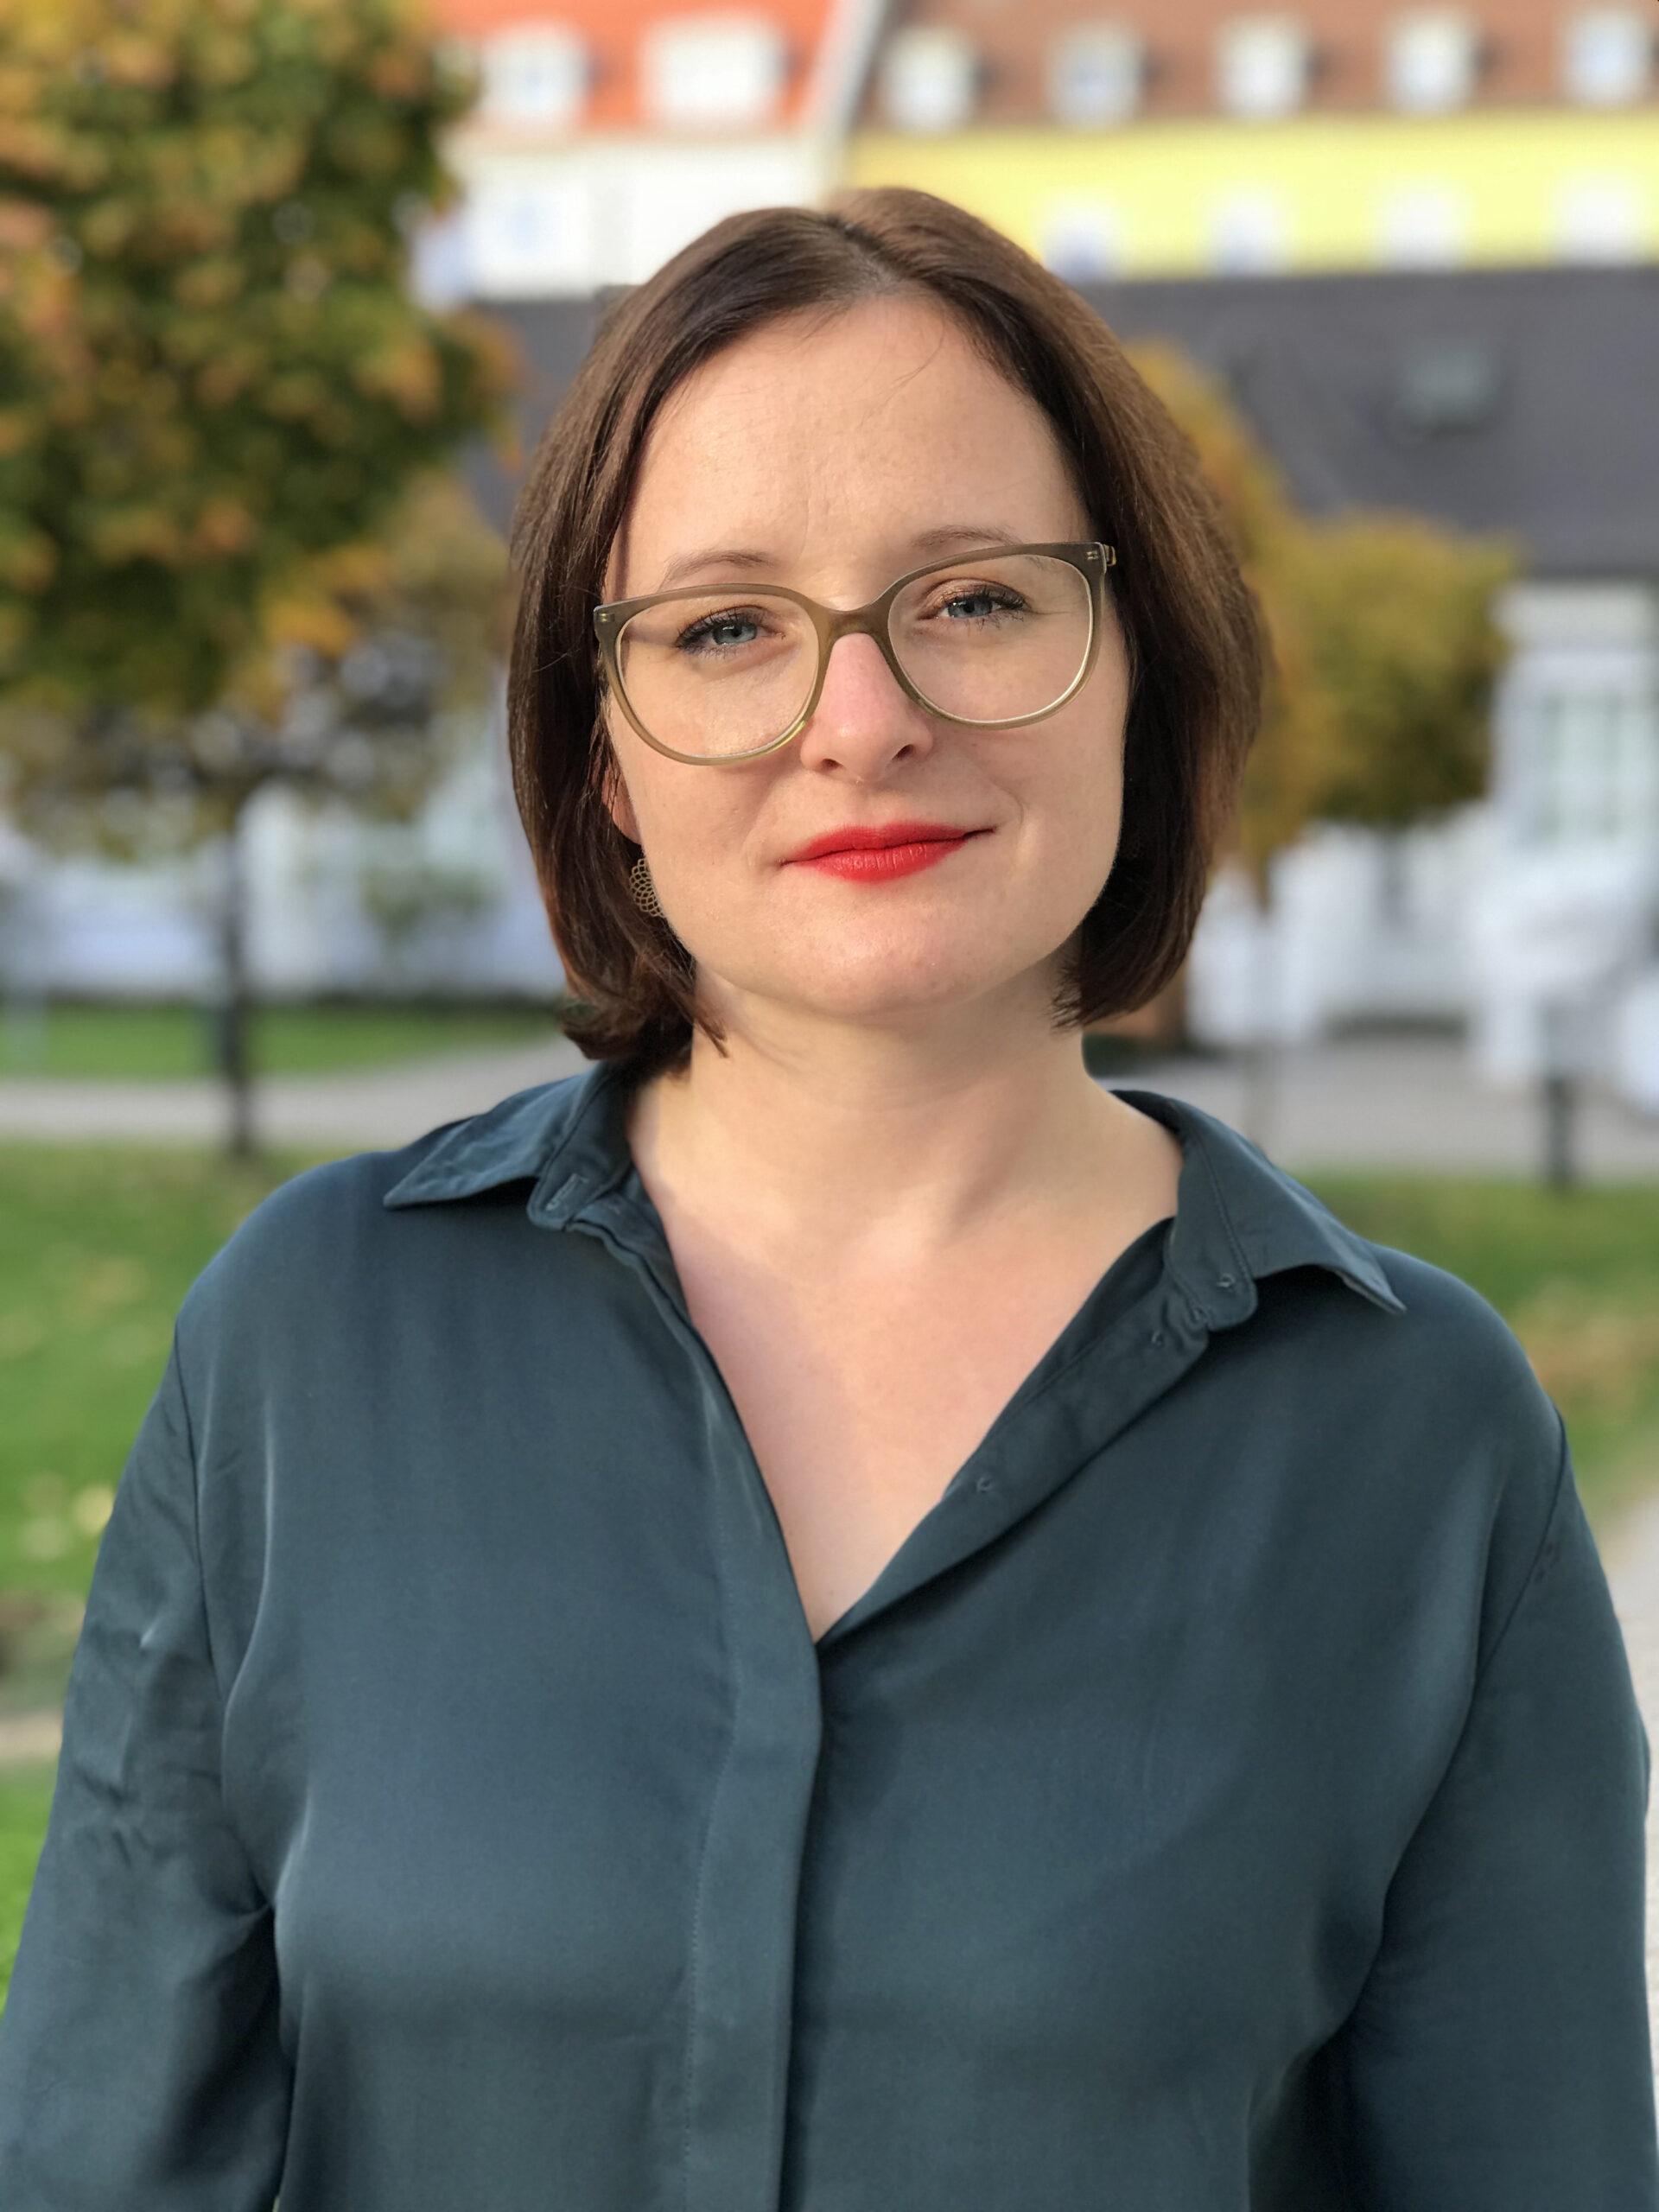 Portrait Bettina Pfotenhauer, blogparade deutungskaempfe